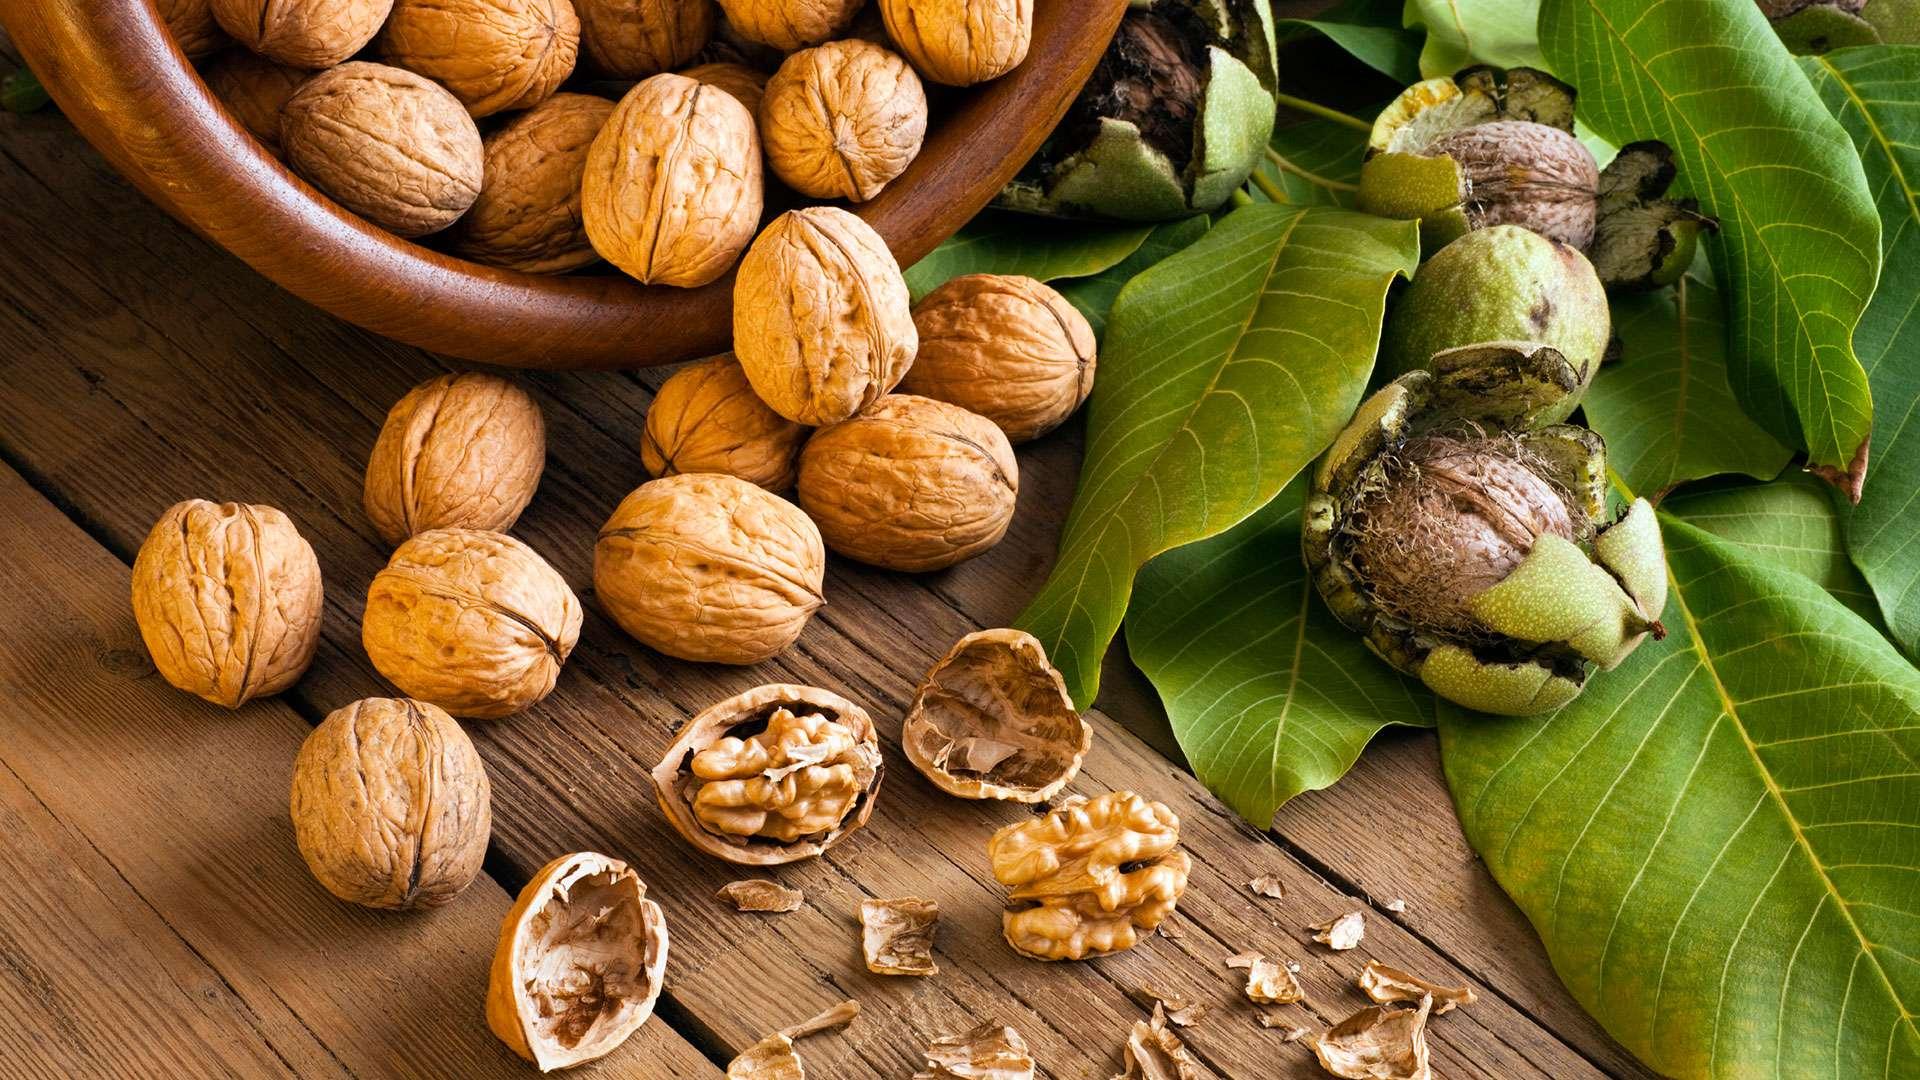 walnut-supplier-manufacturer-ukraine-export-importer-nuts-hazelnuts-11_compressed